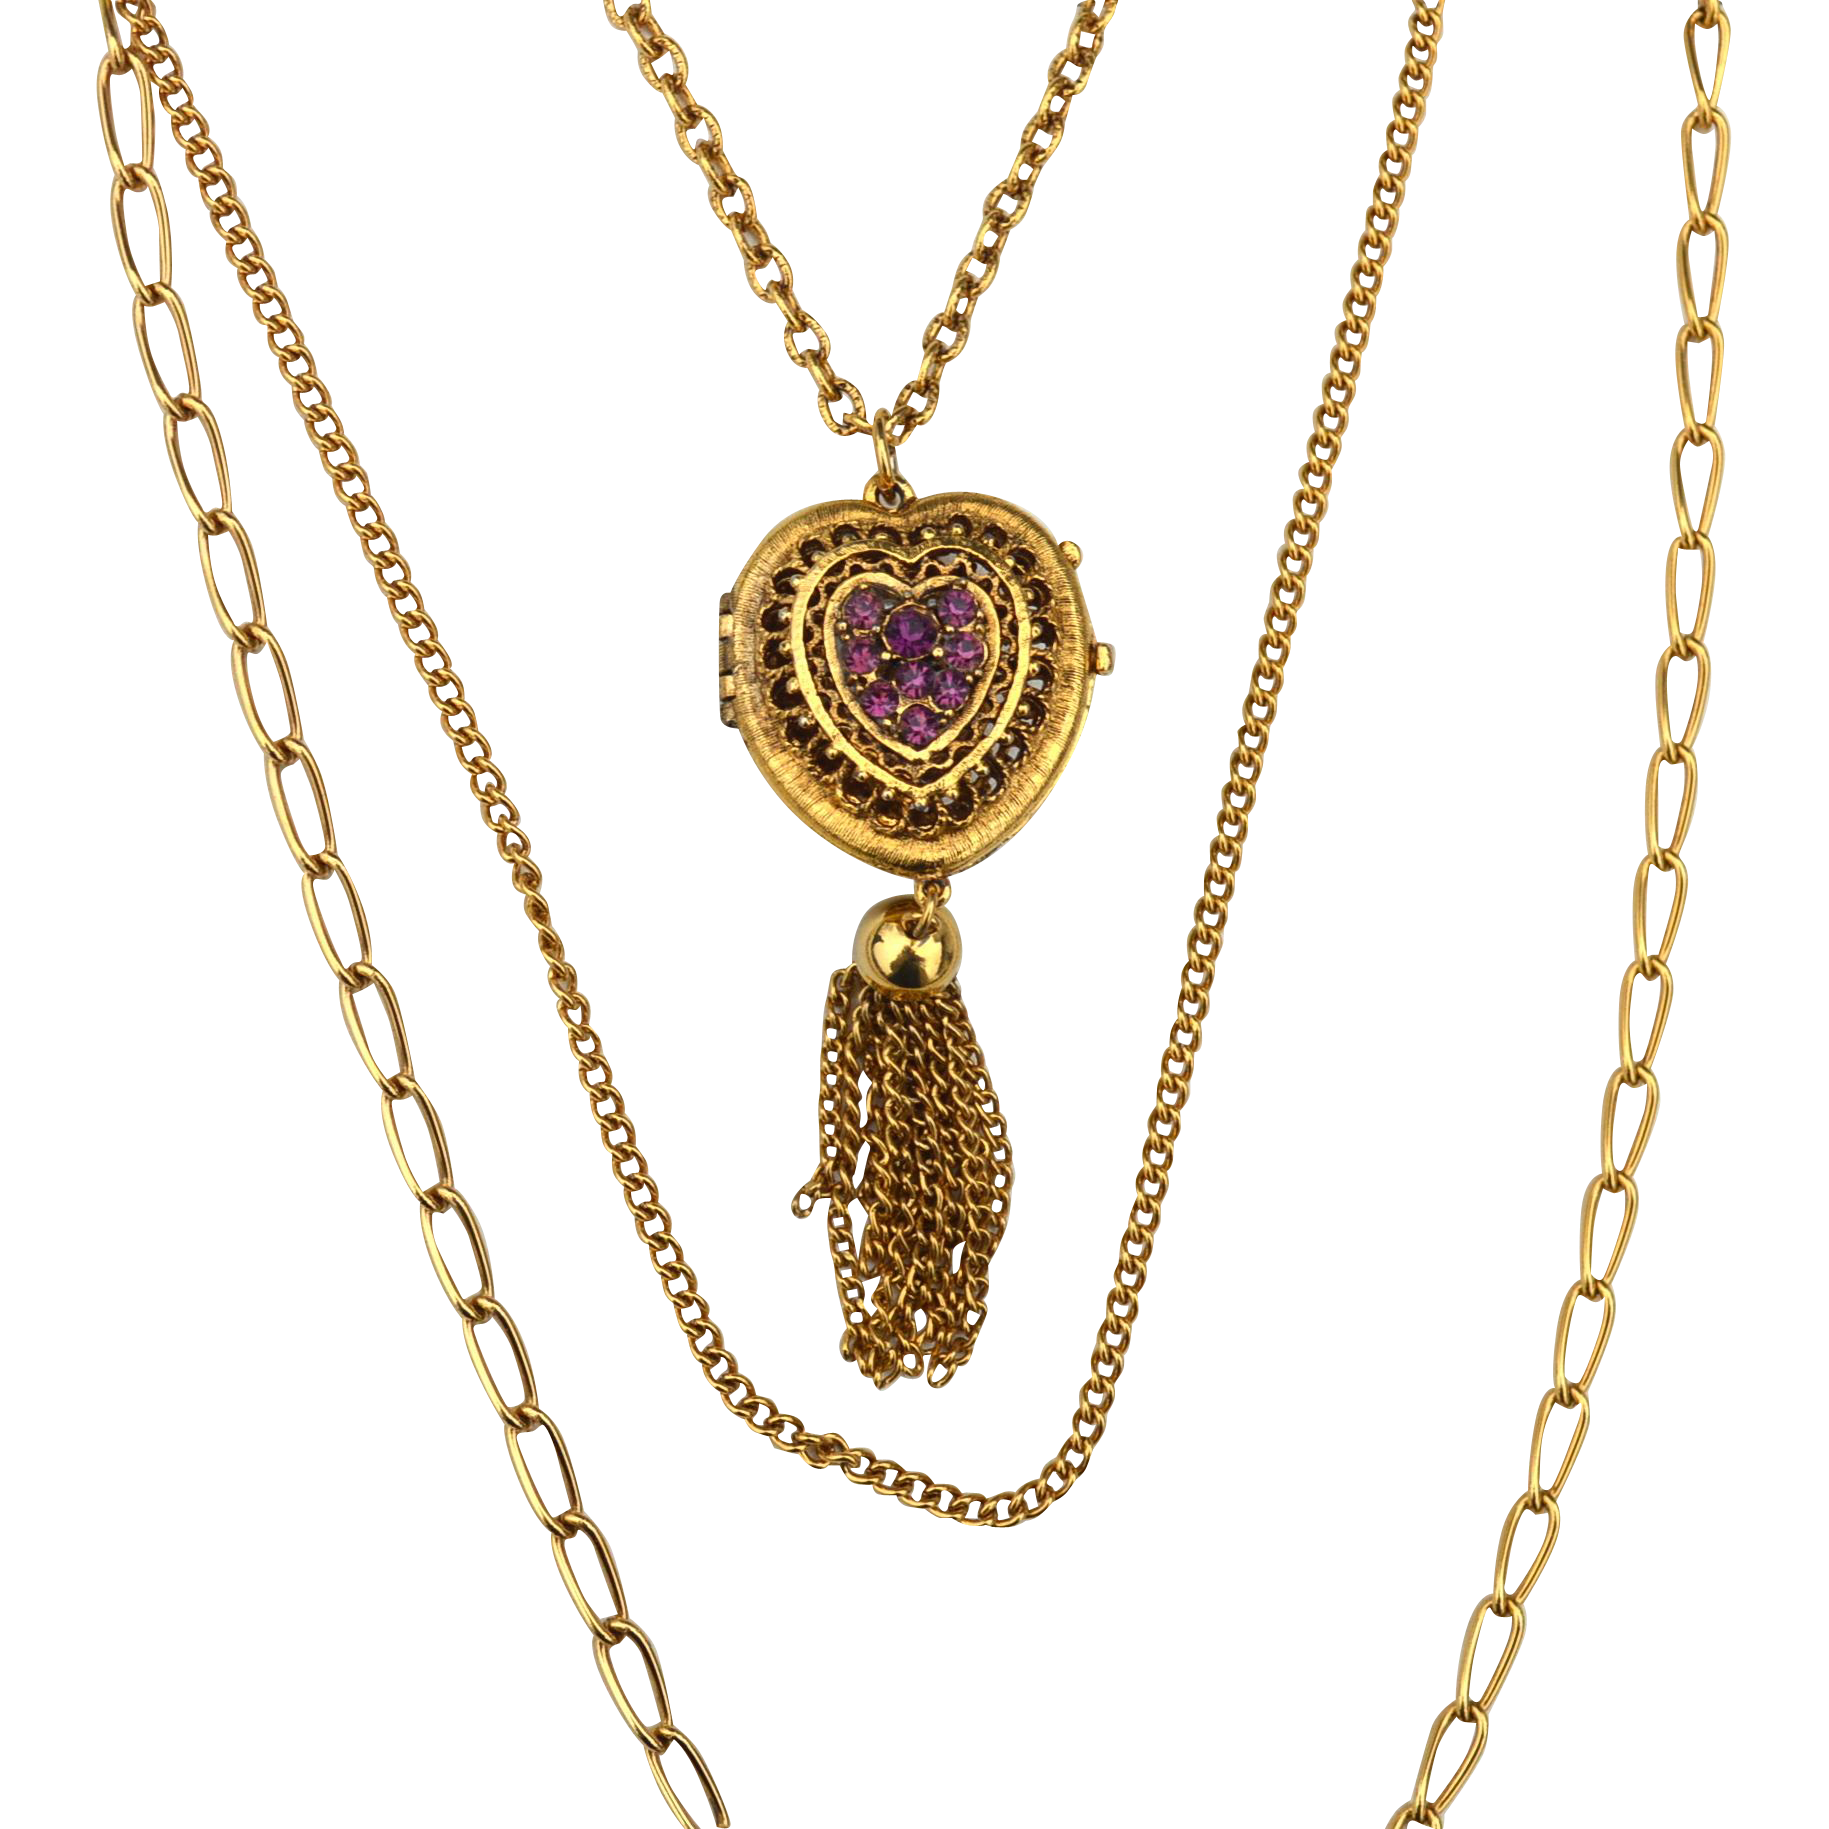 Vintage Triple Strand Necklace with Heart Locket, Purple Rhinestone